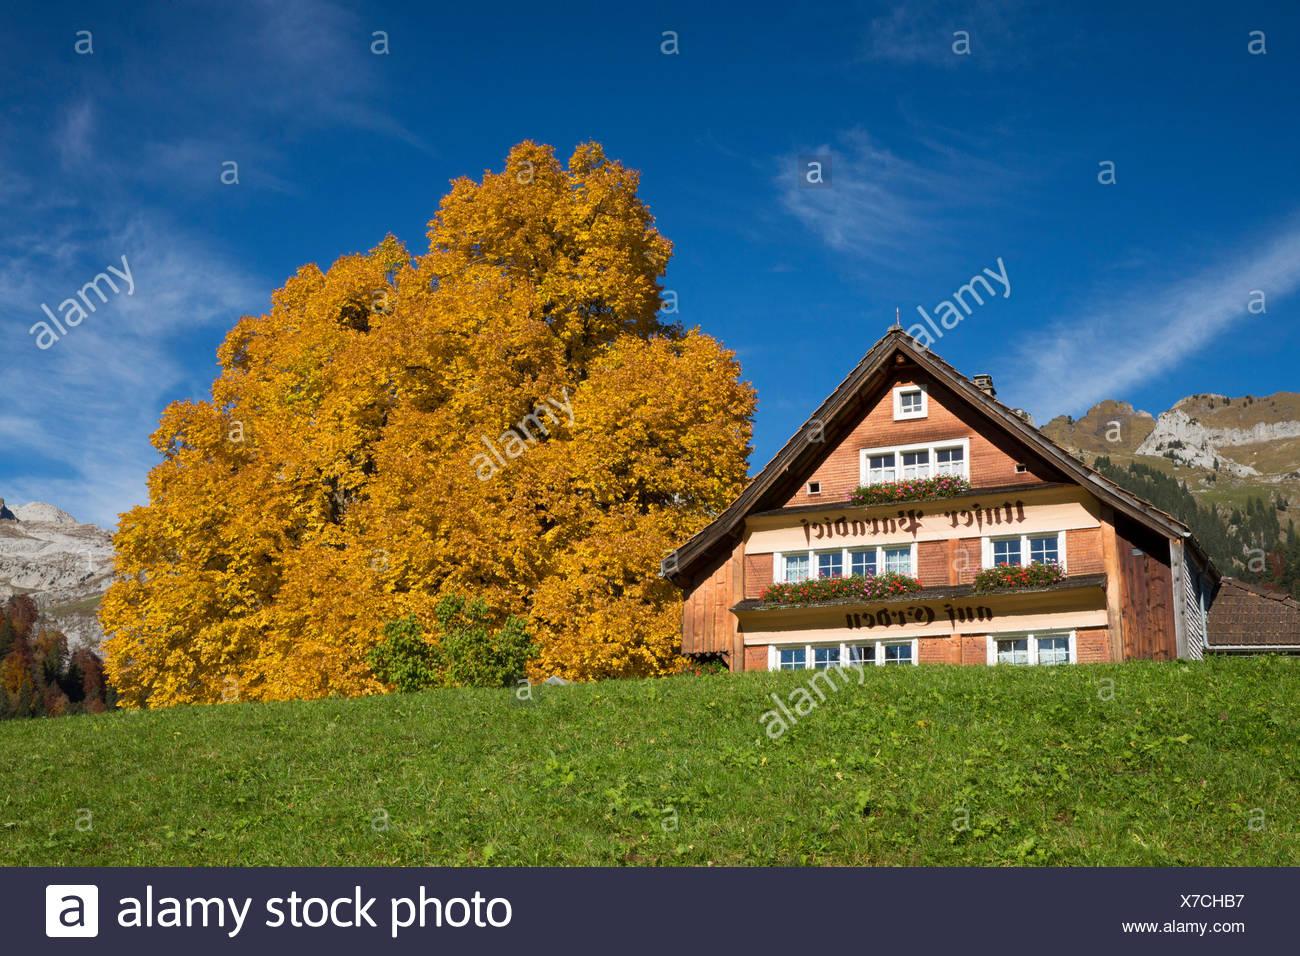 Toggenburg, Unterwasser, SG Alpstein, Säntis, montaña, montañas, otoño, SG, en el cantón de San Gallen, Toggenburg, Alpstein, Säntis, Foto de stock